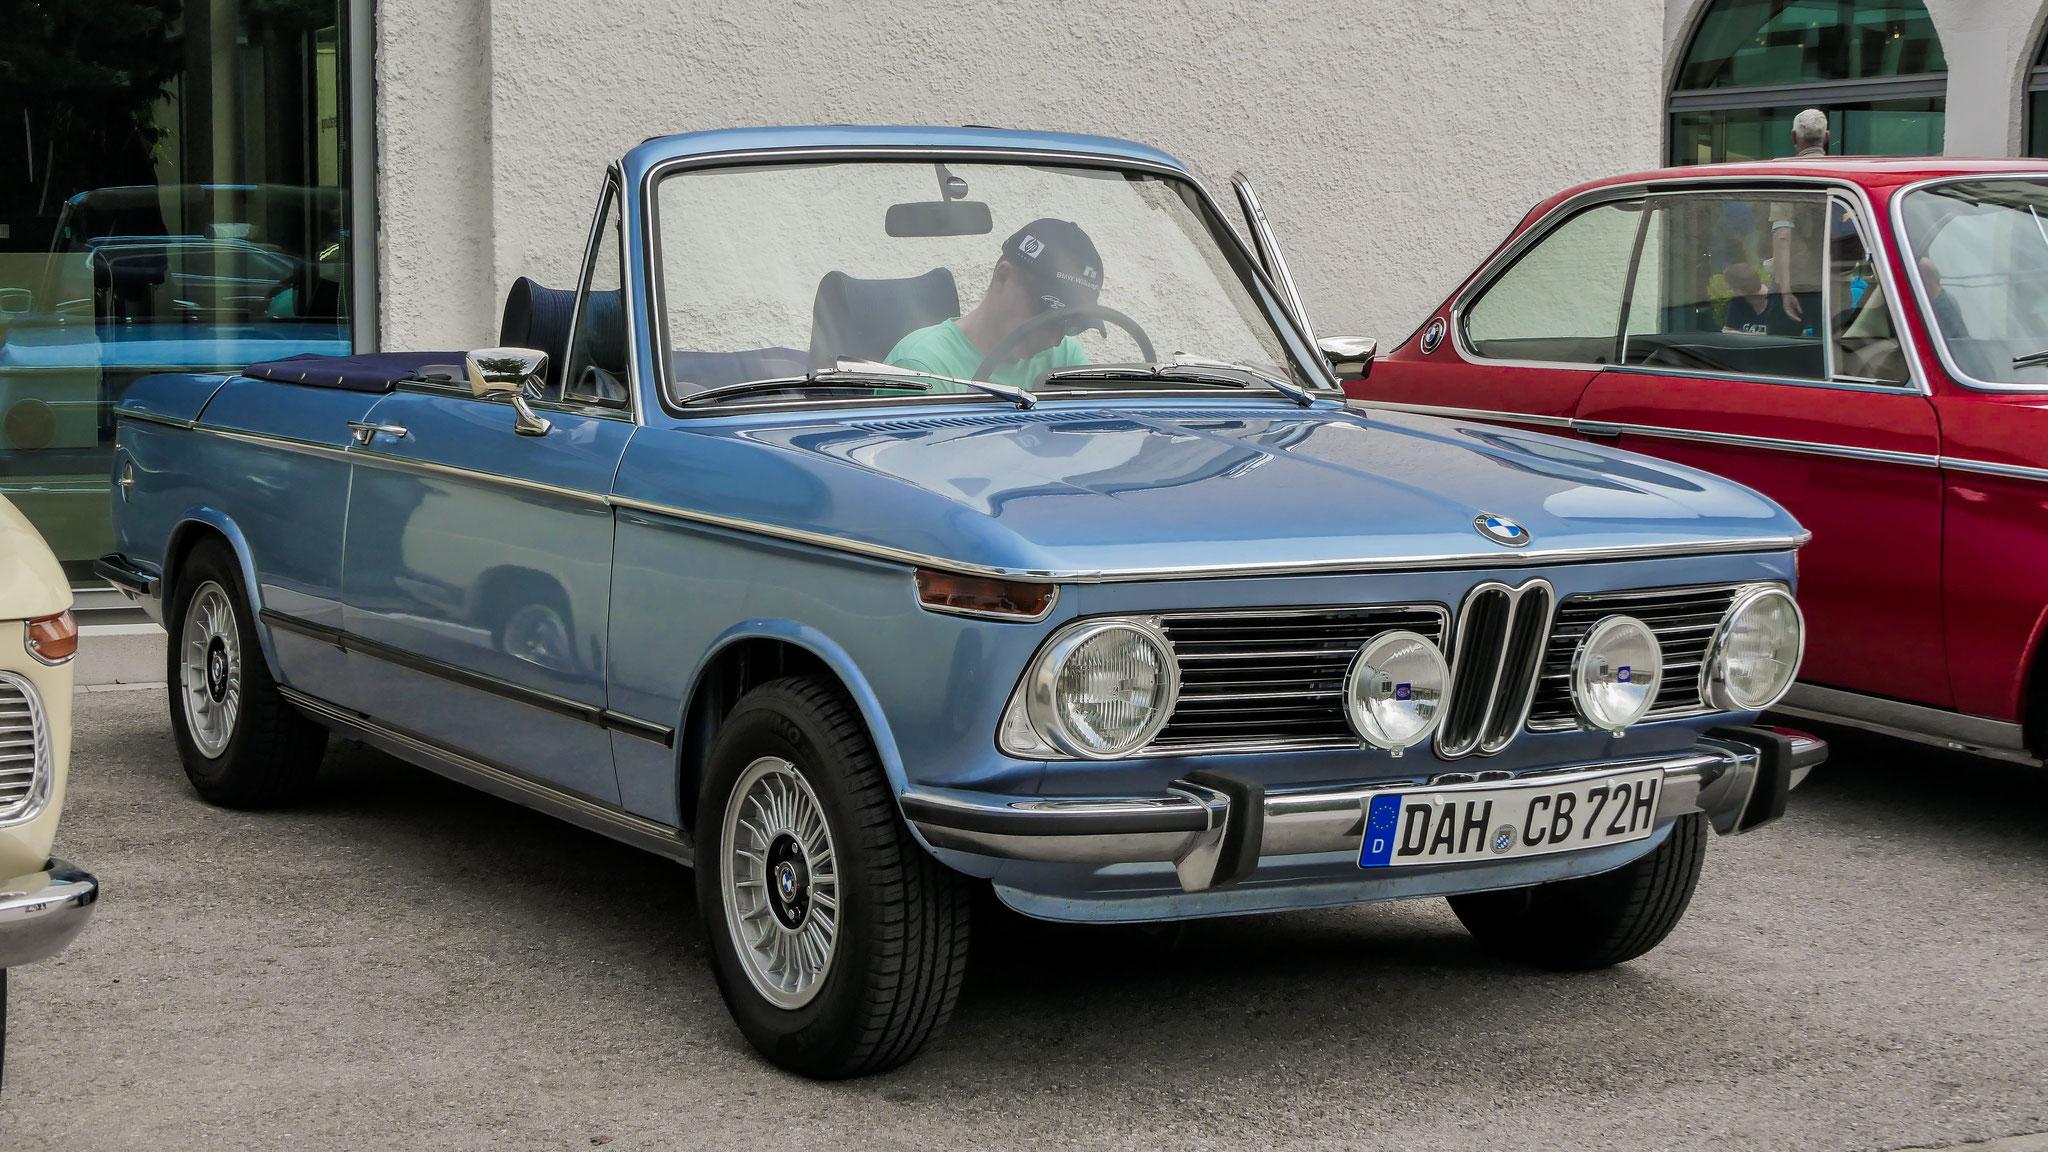 BMW 1600 Cabriolet - DAH-CB-72H